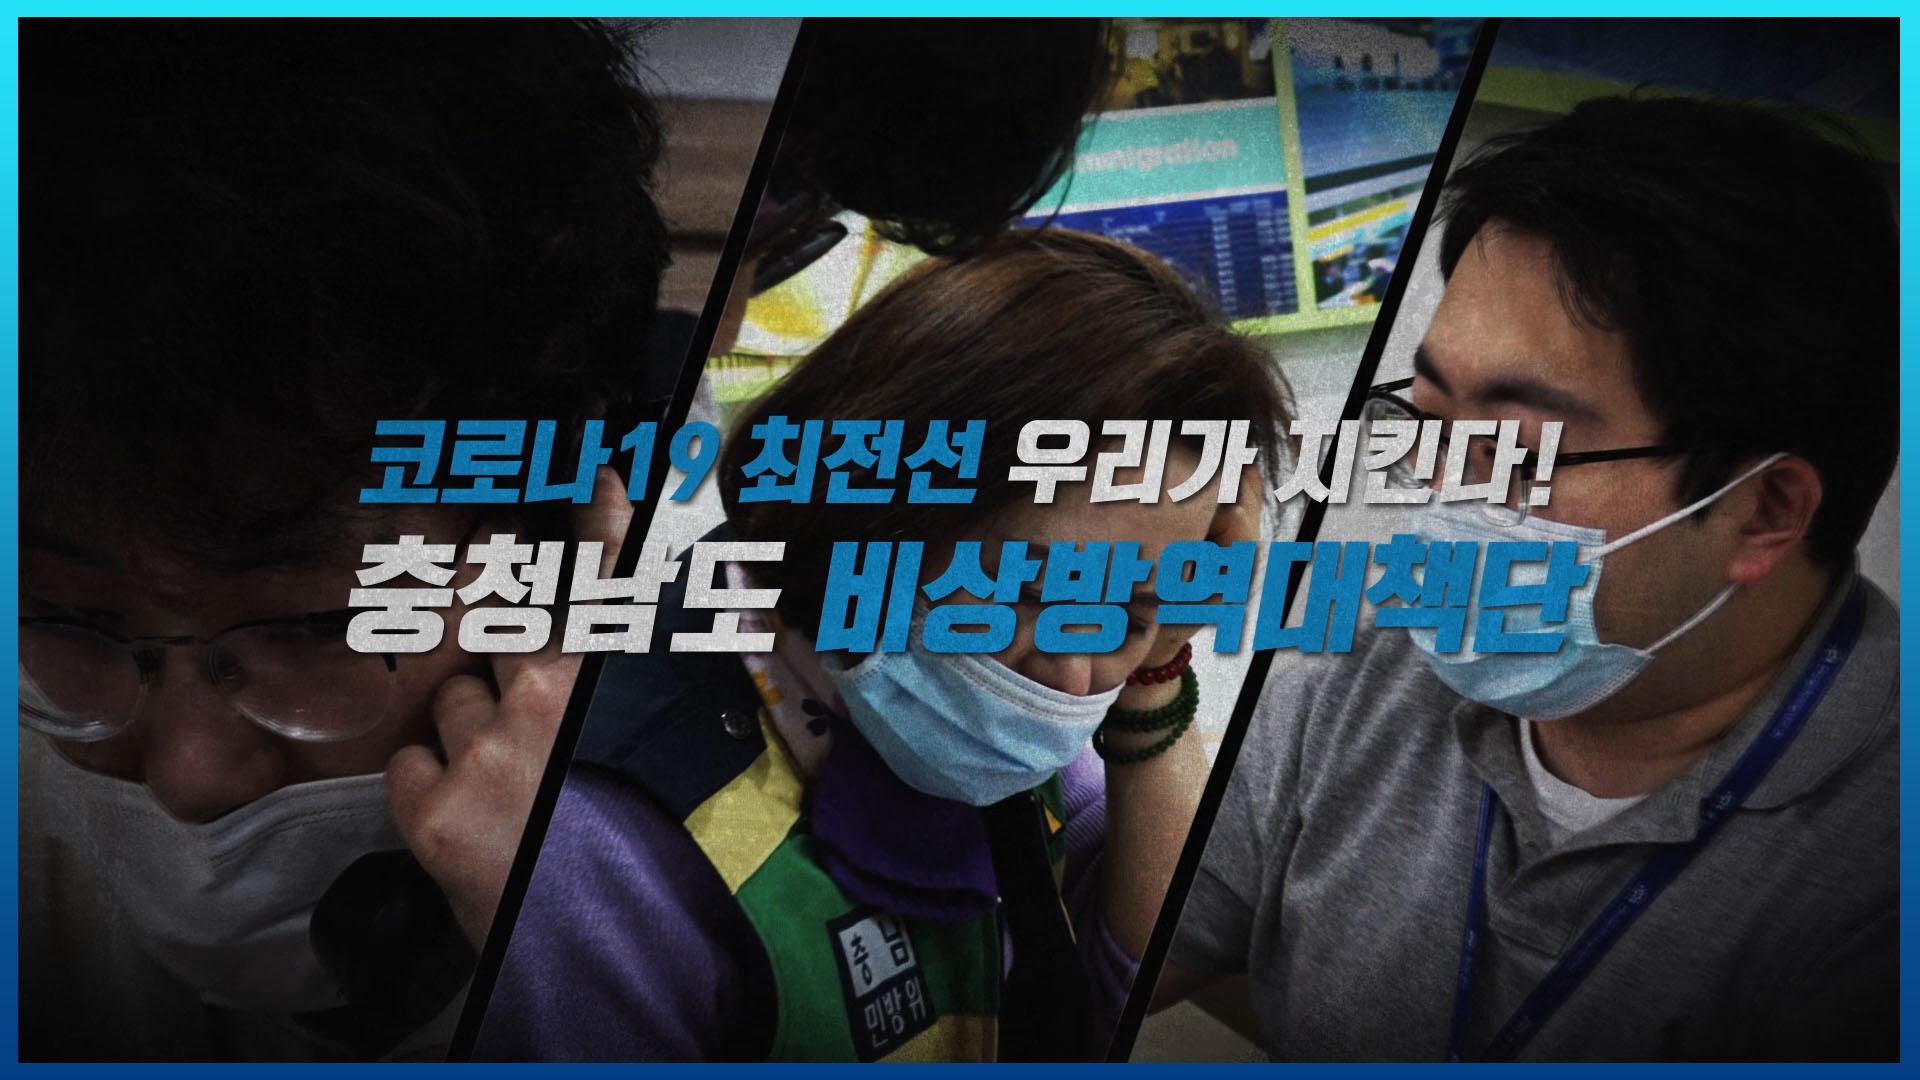 [NEWS] 충청남도 비상방역대책단/ 코로나19 얼굴 없는 영웅들